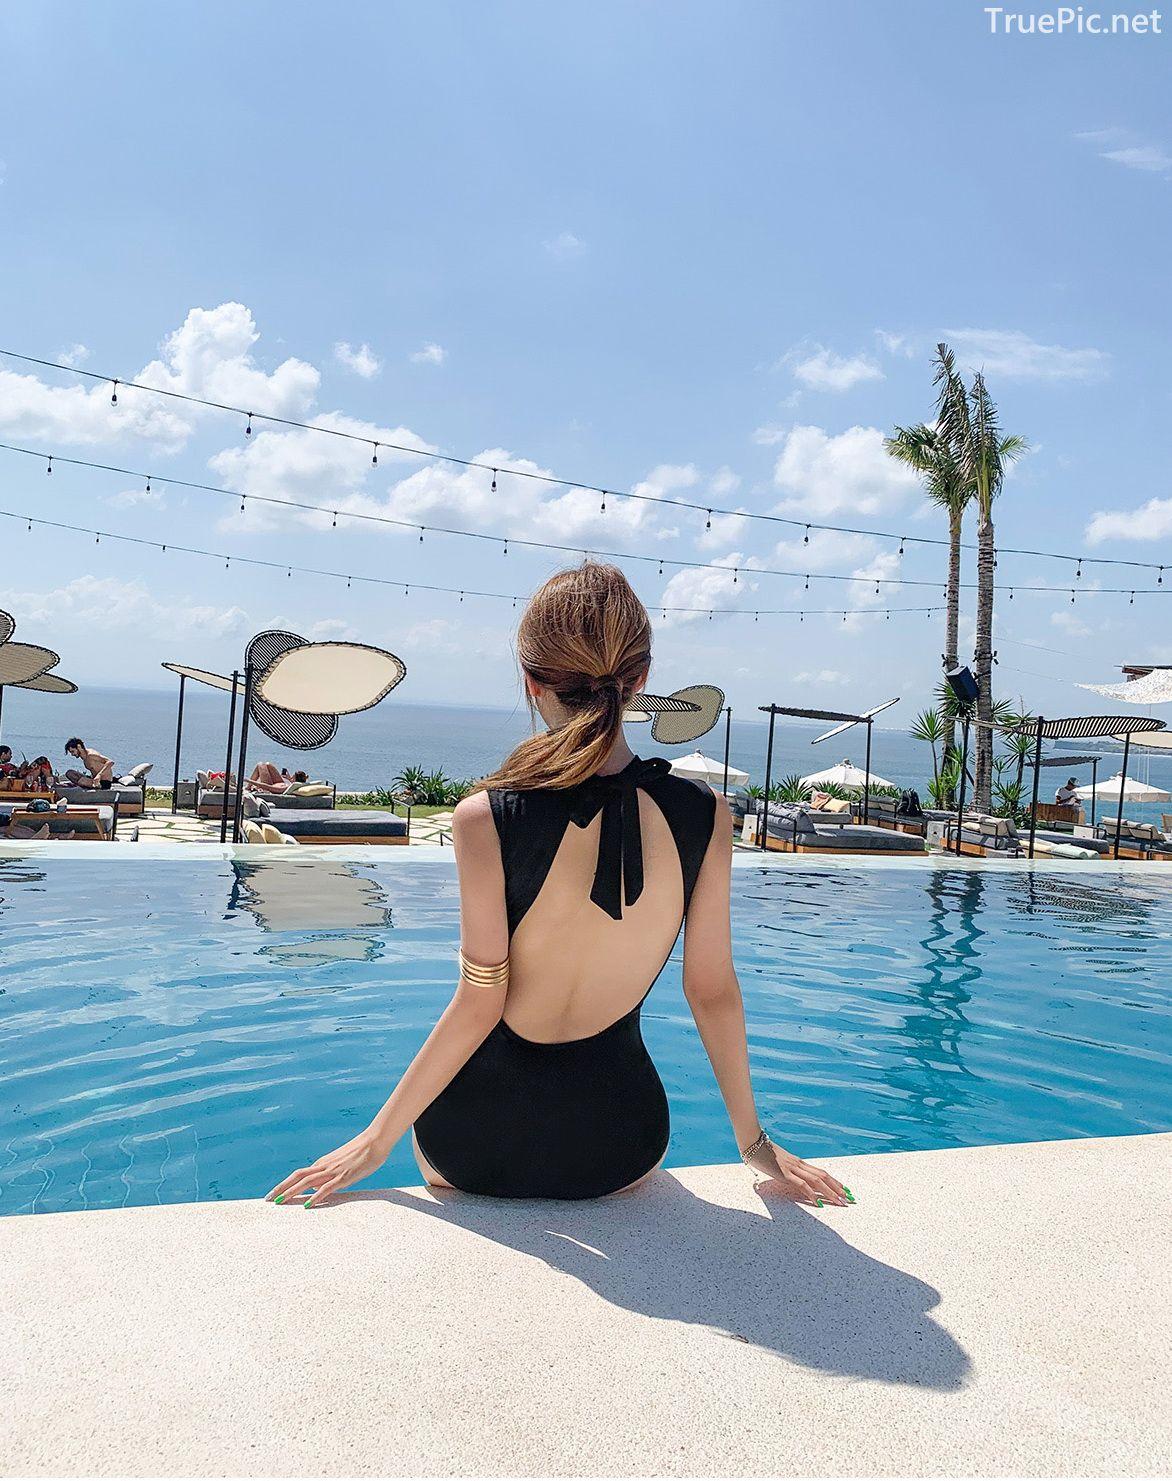 Korean fashion model - Cha Yoo Jin - Half Neck Black Monokini - TruePic.net - Picture 10